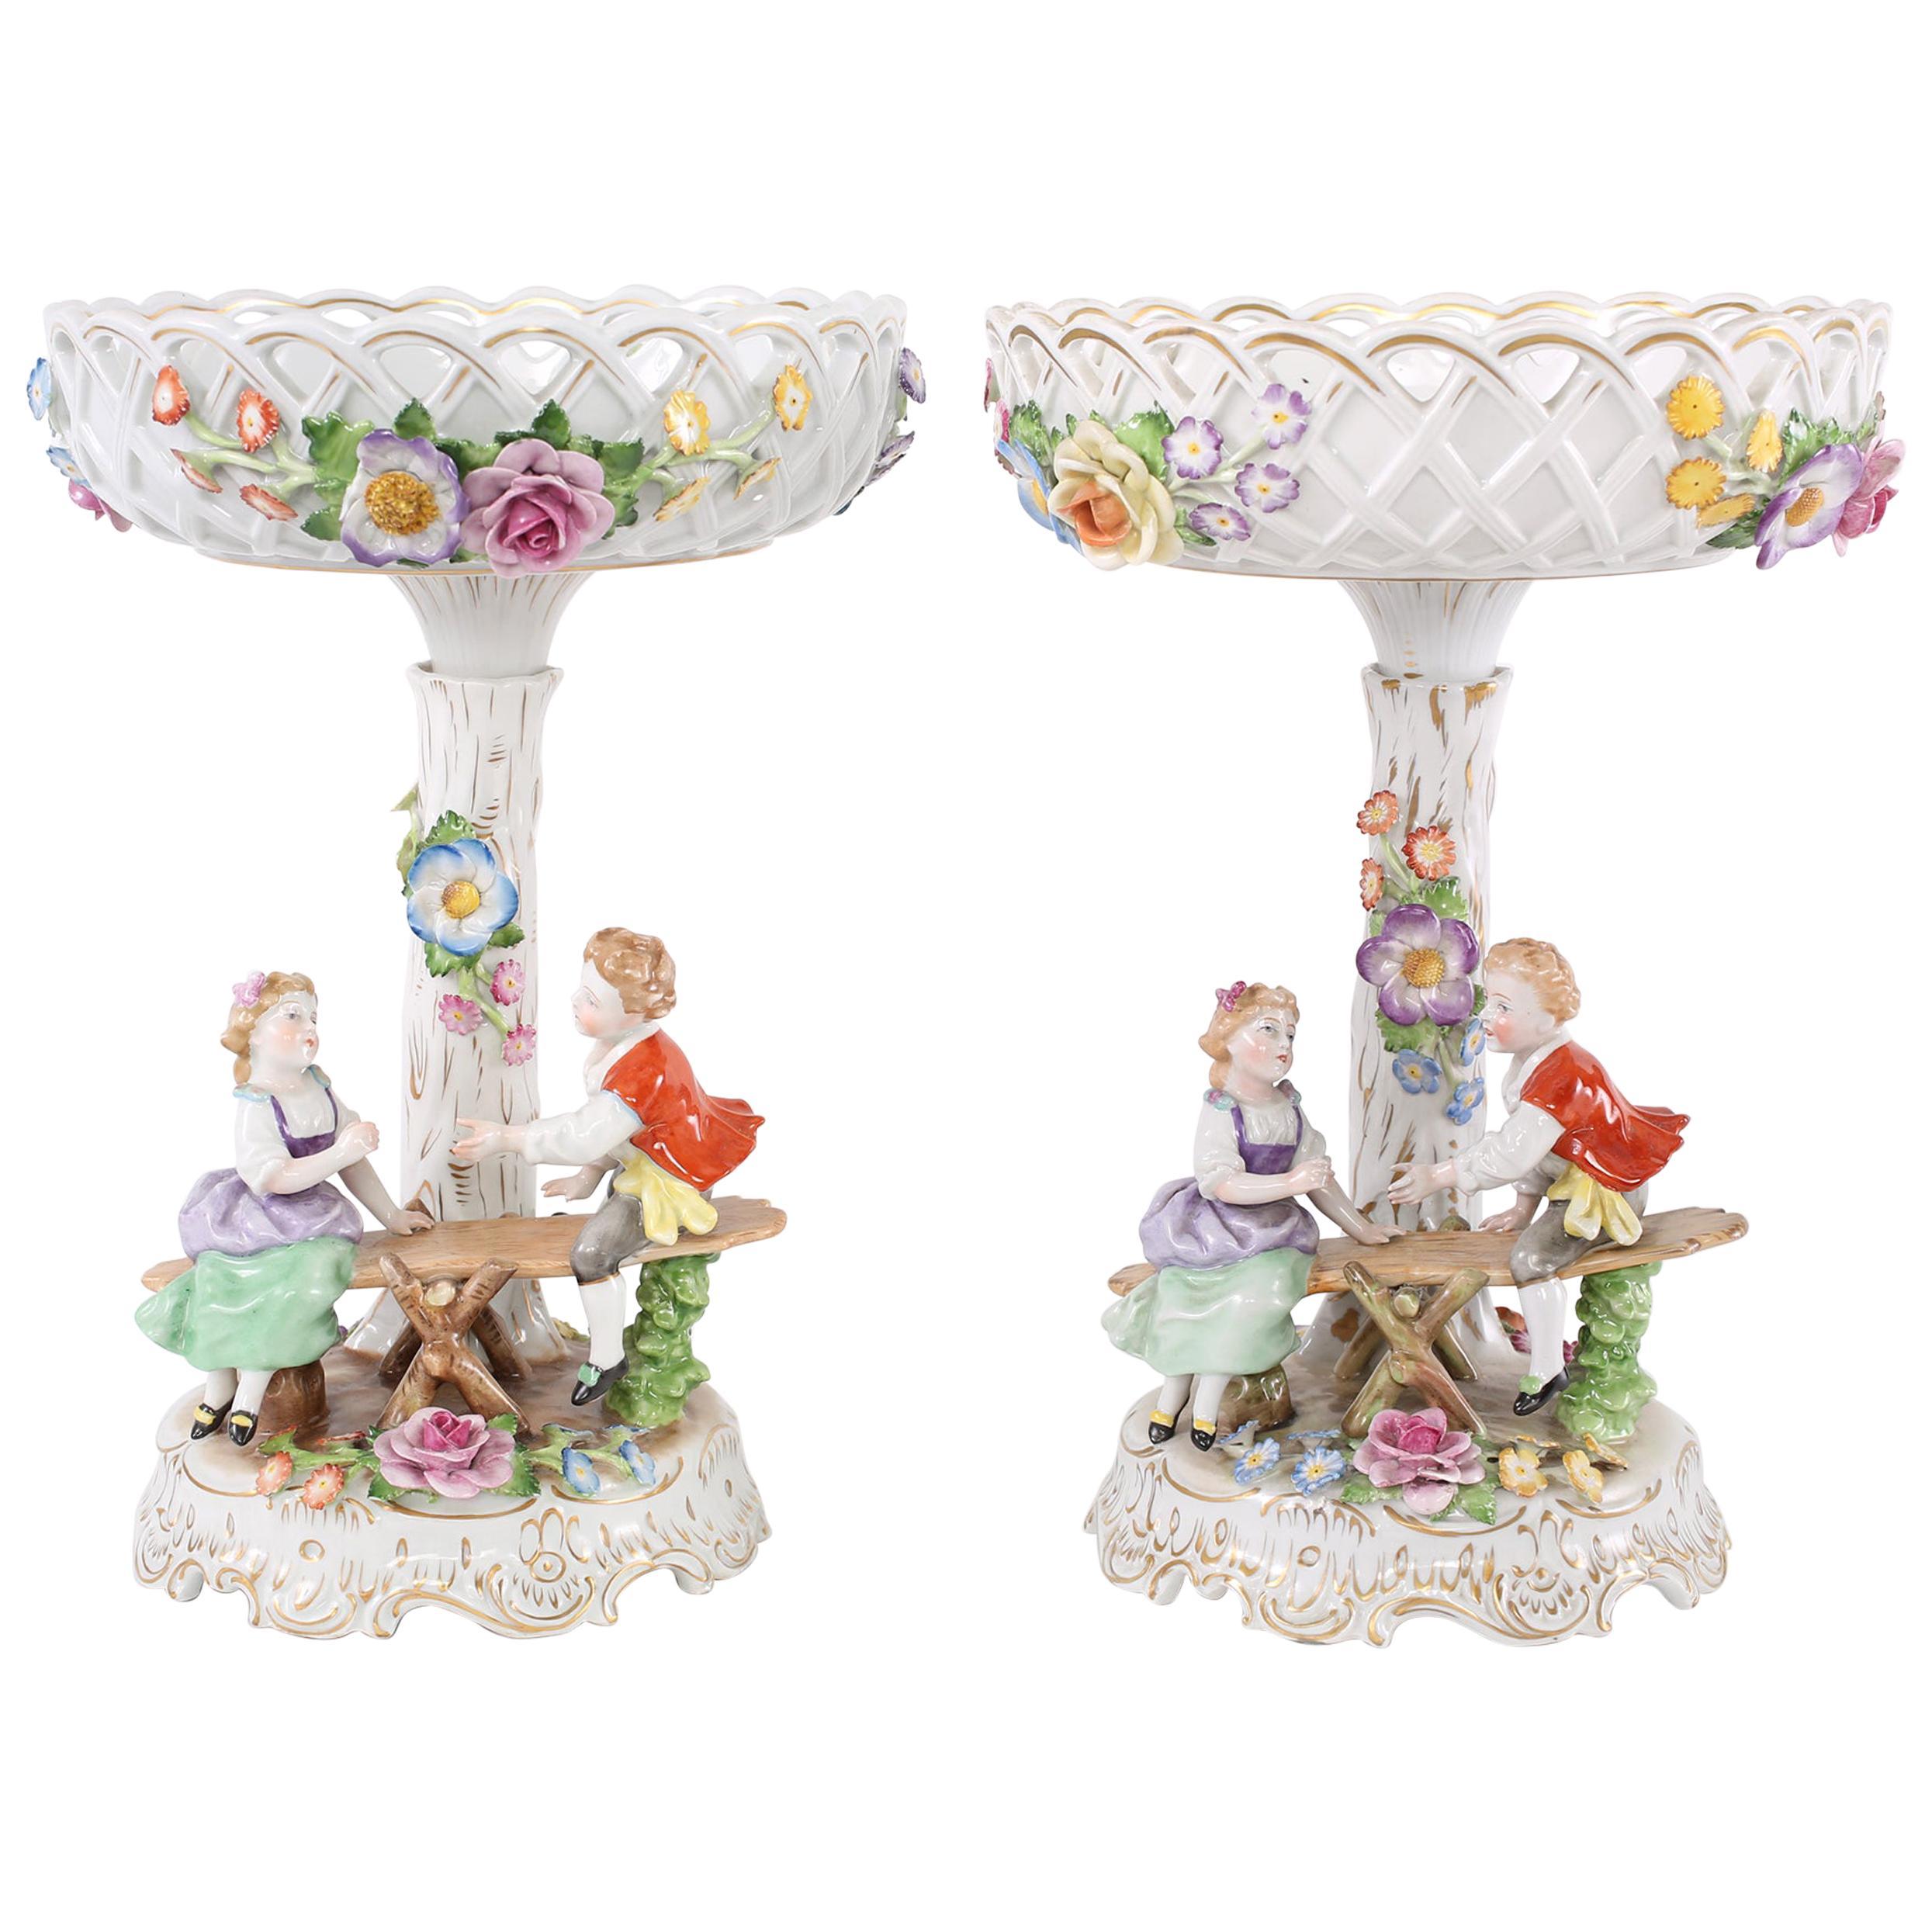 Early 20th Century German Porcelain Decorative Pieces